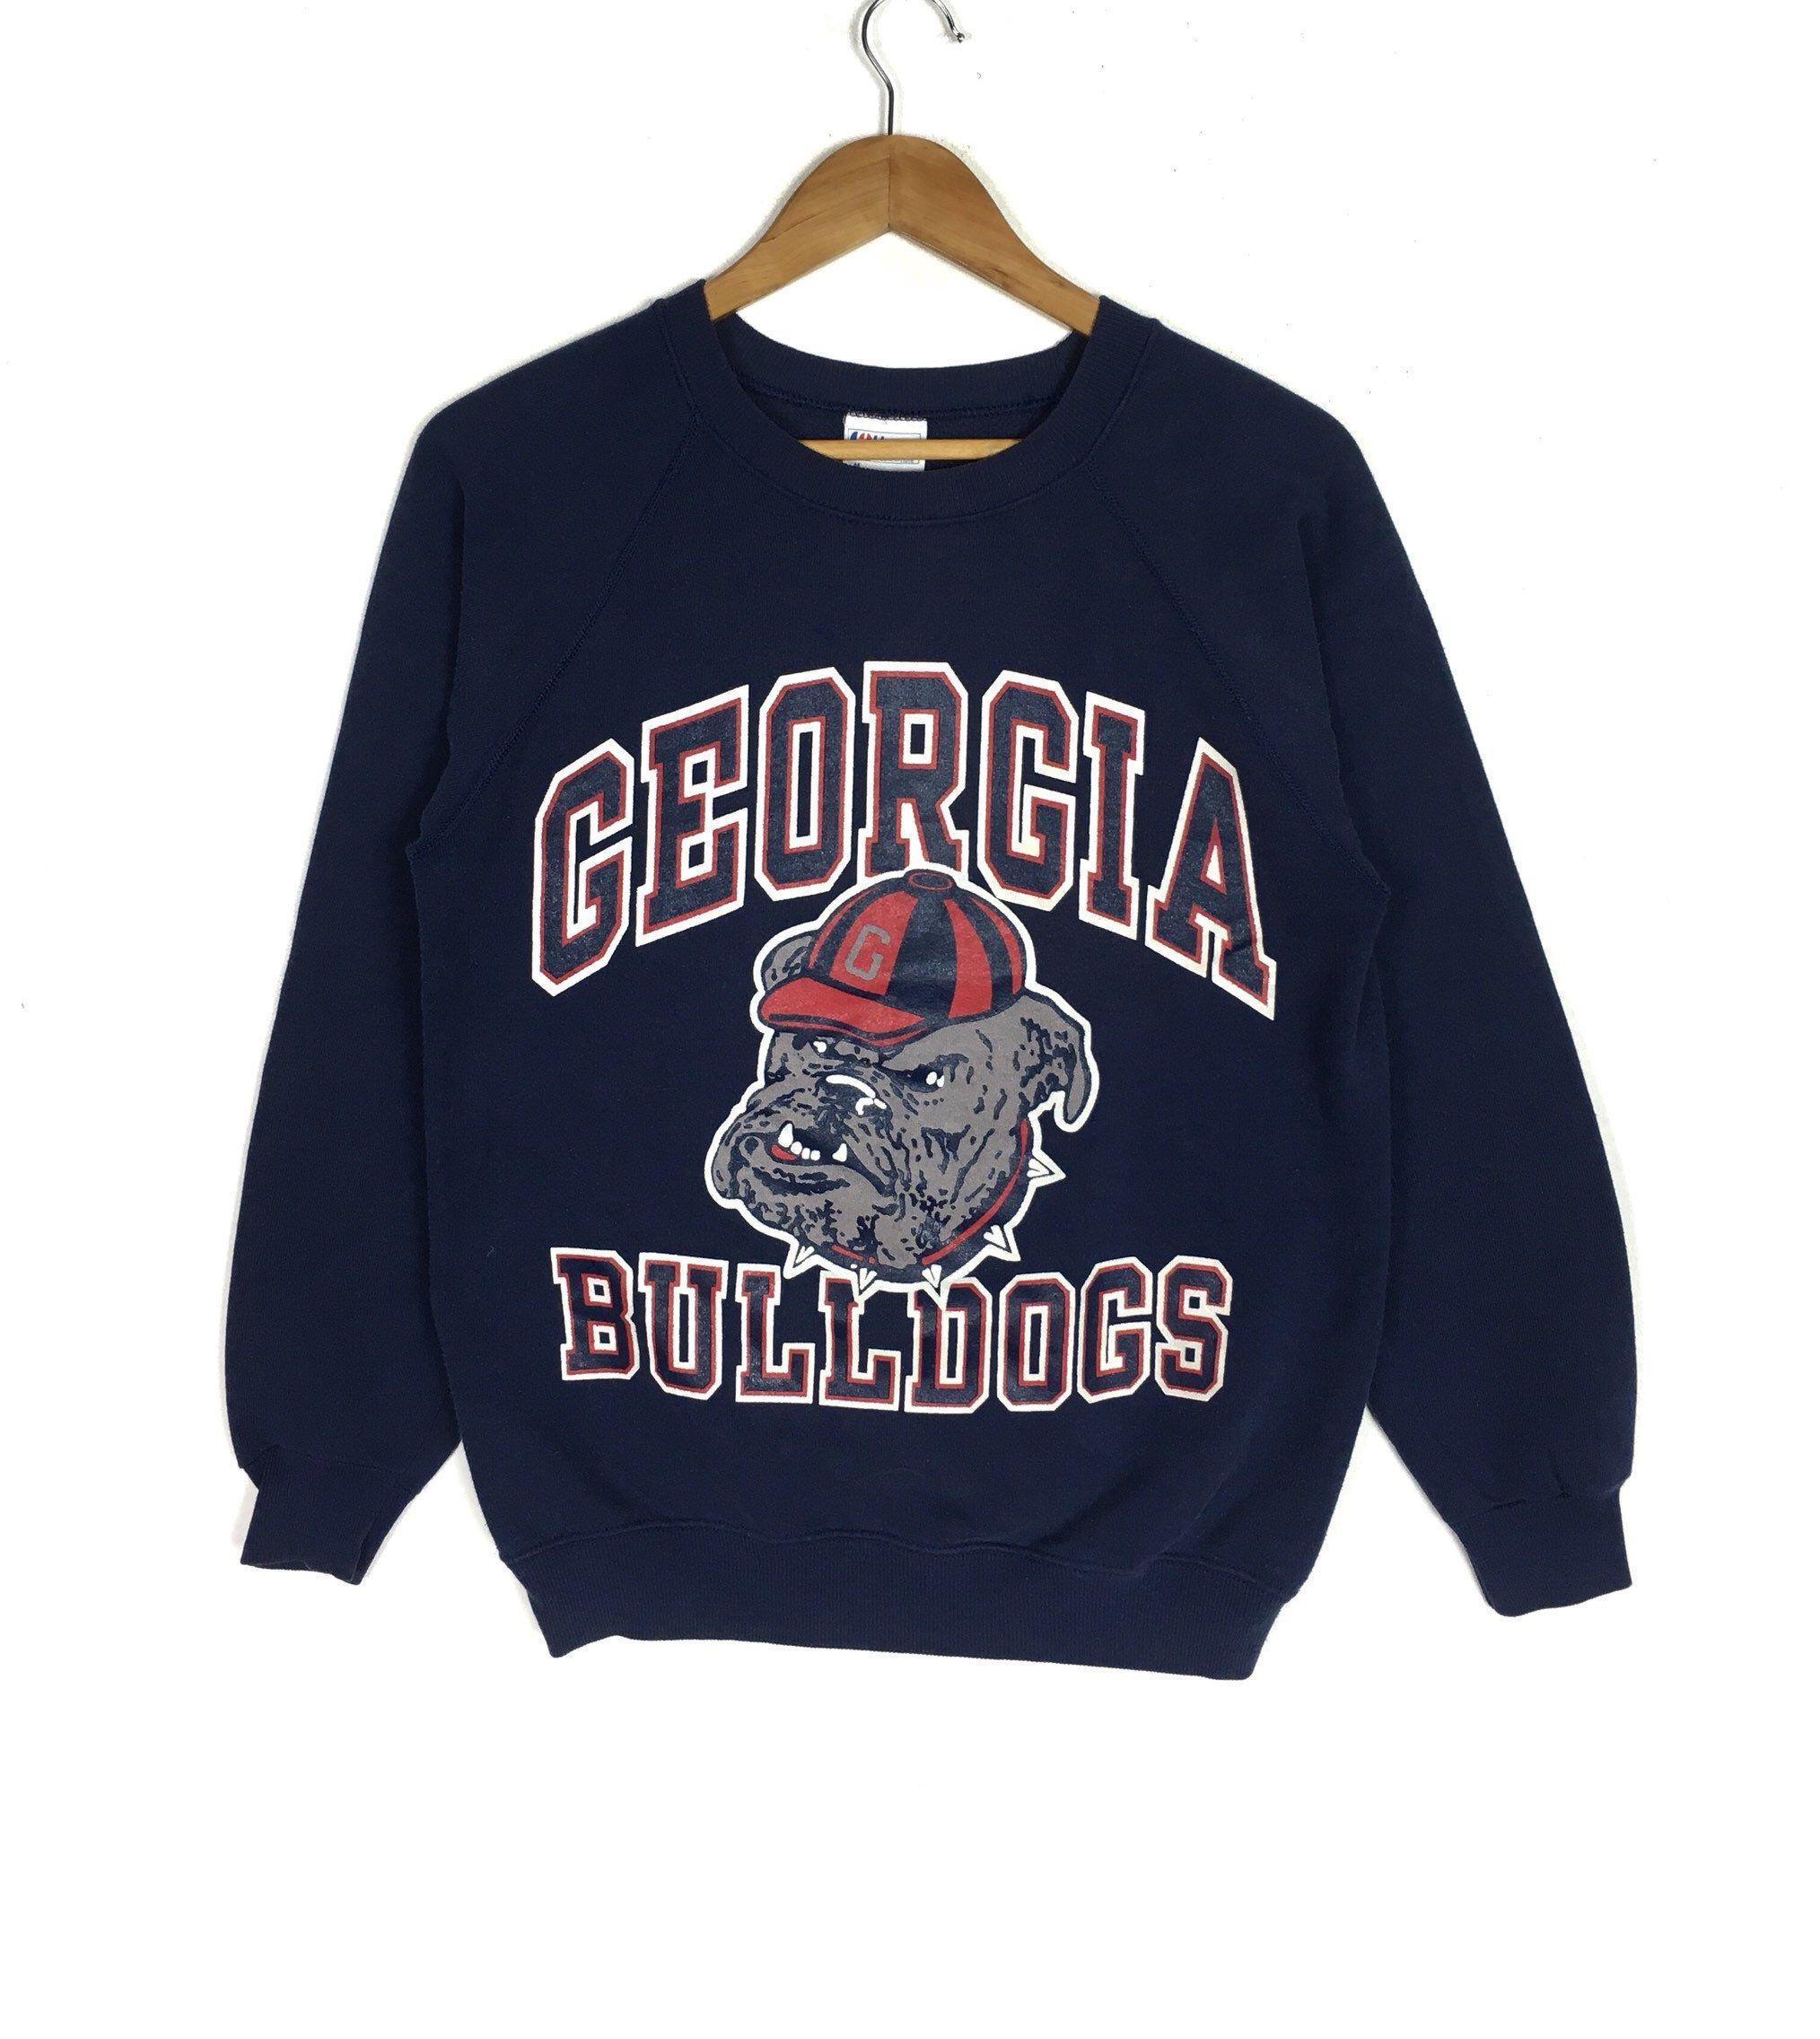 80s Georgia University Sweatshirt Bulldogs M Size Etsy Sweatshirts University Sweatshirts 80s Sport [ 2272 x 2028 Pixel ]